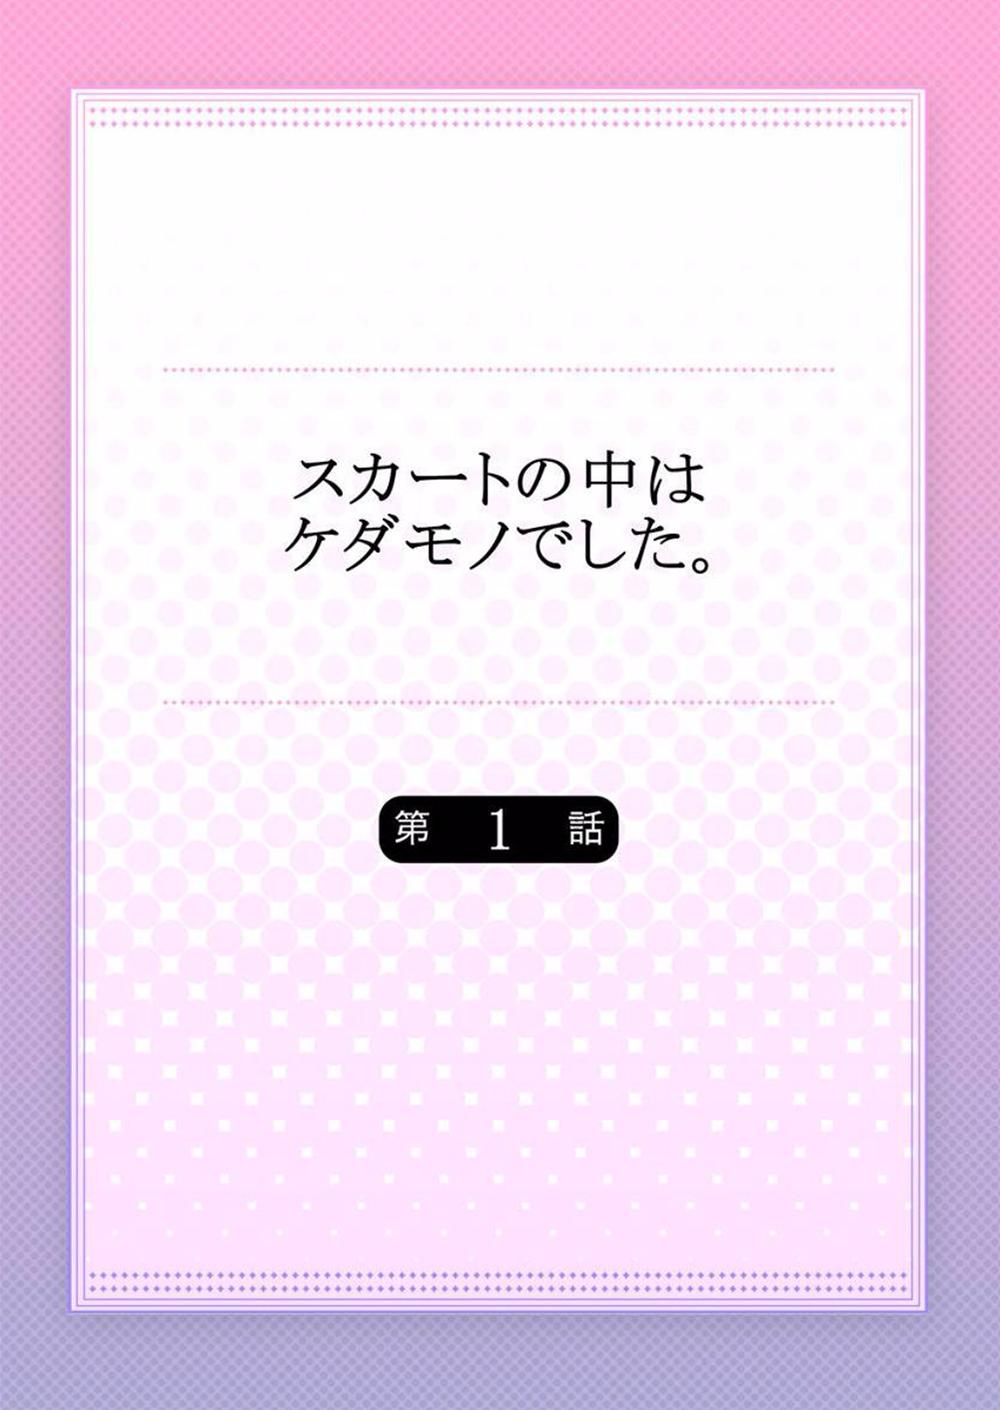 Hình ảnh 2 trong bài viết Skirt no Naka wa Kedamono Deshita